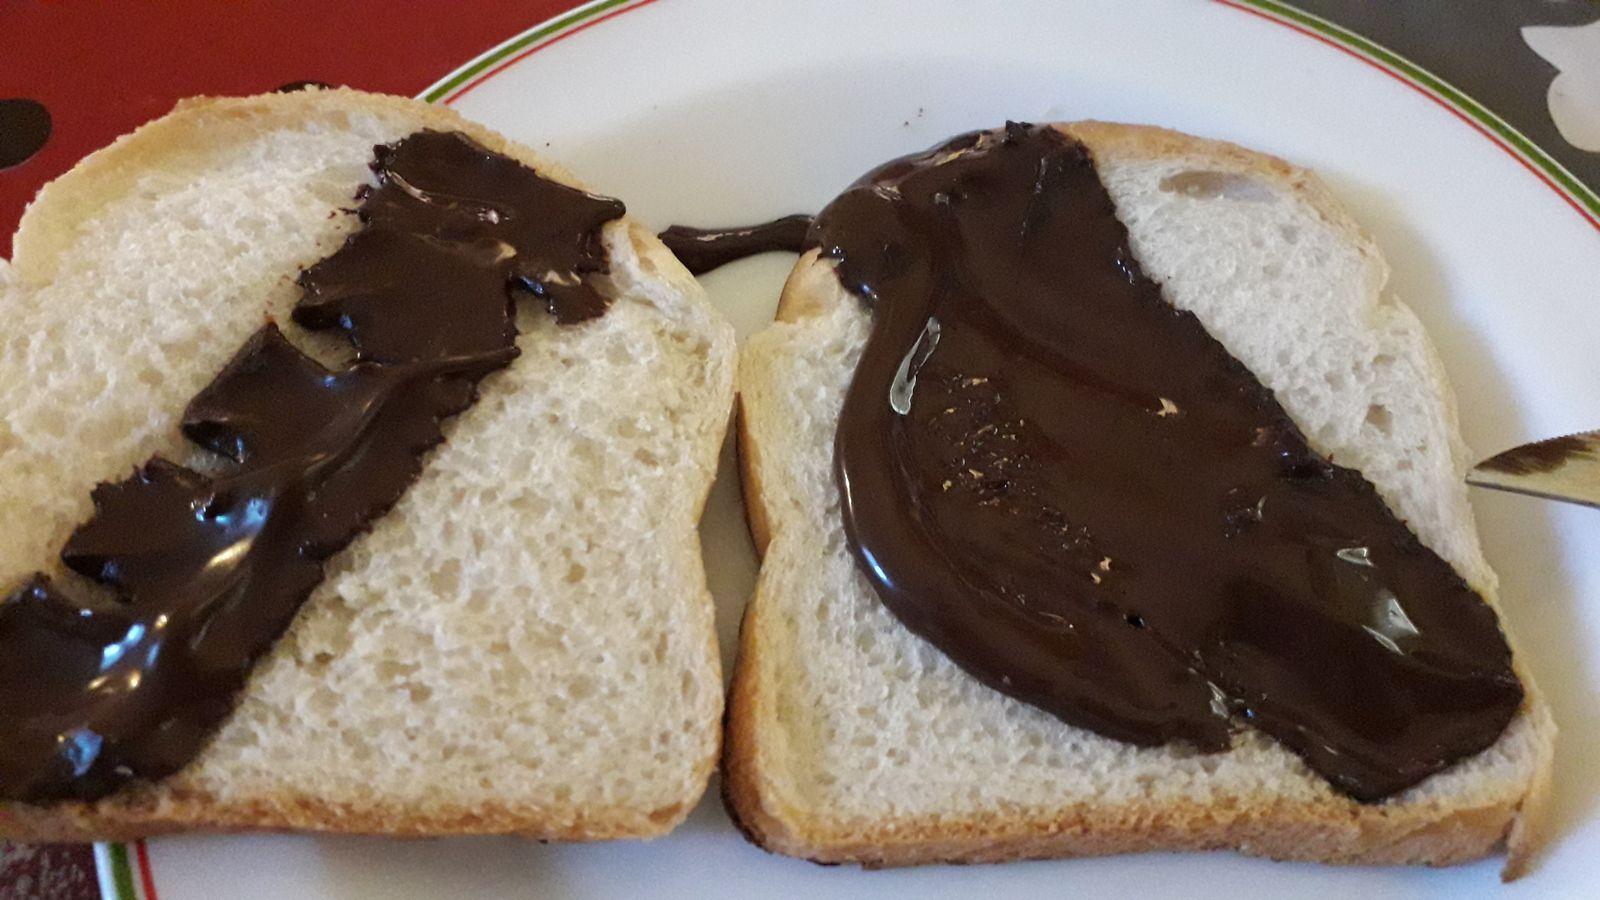 Croque monsieur au chocolat